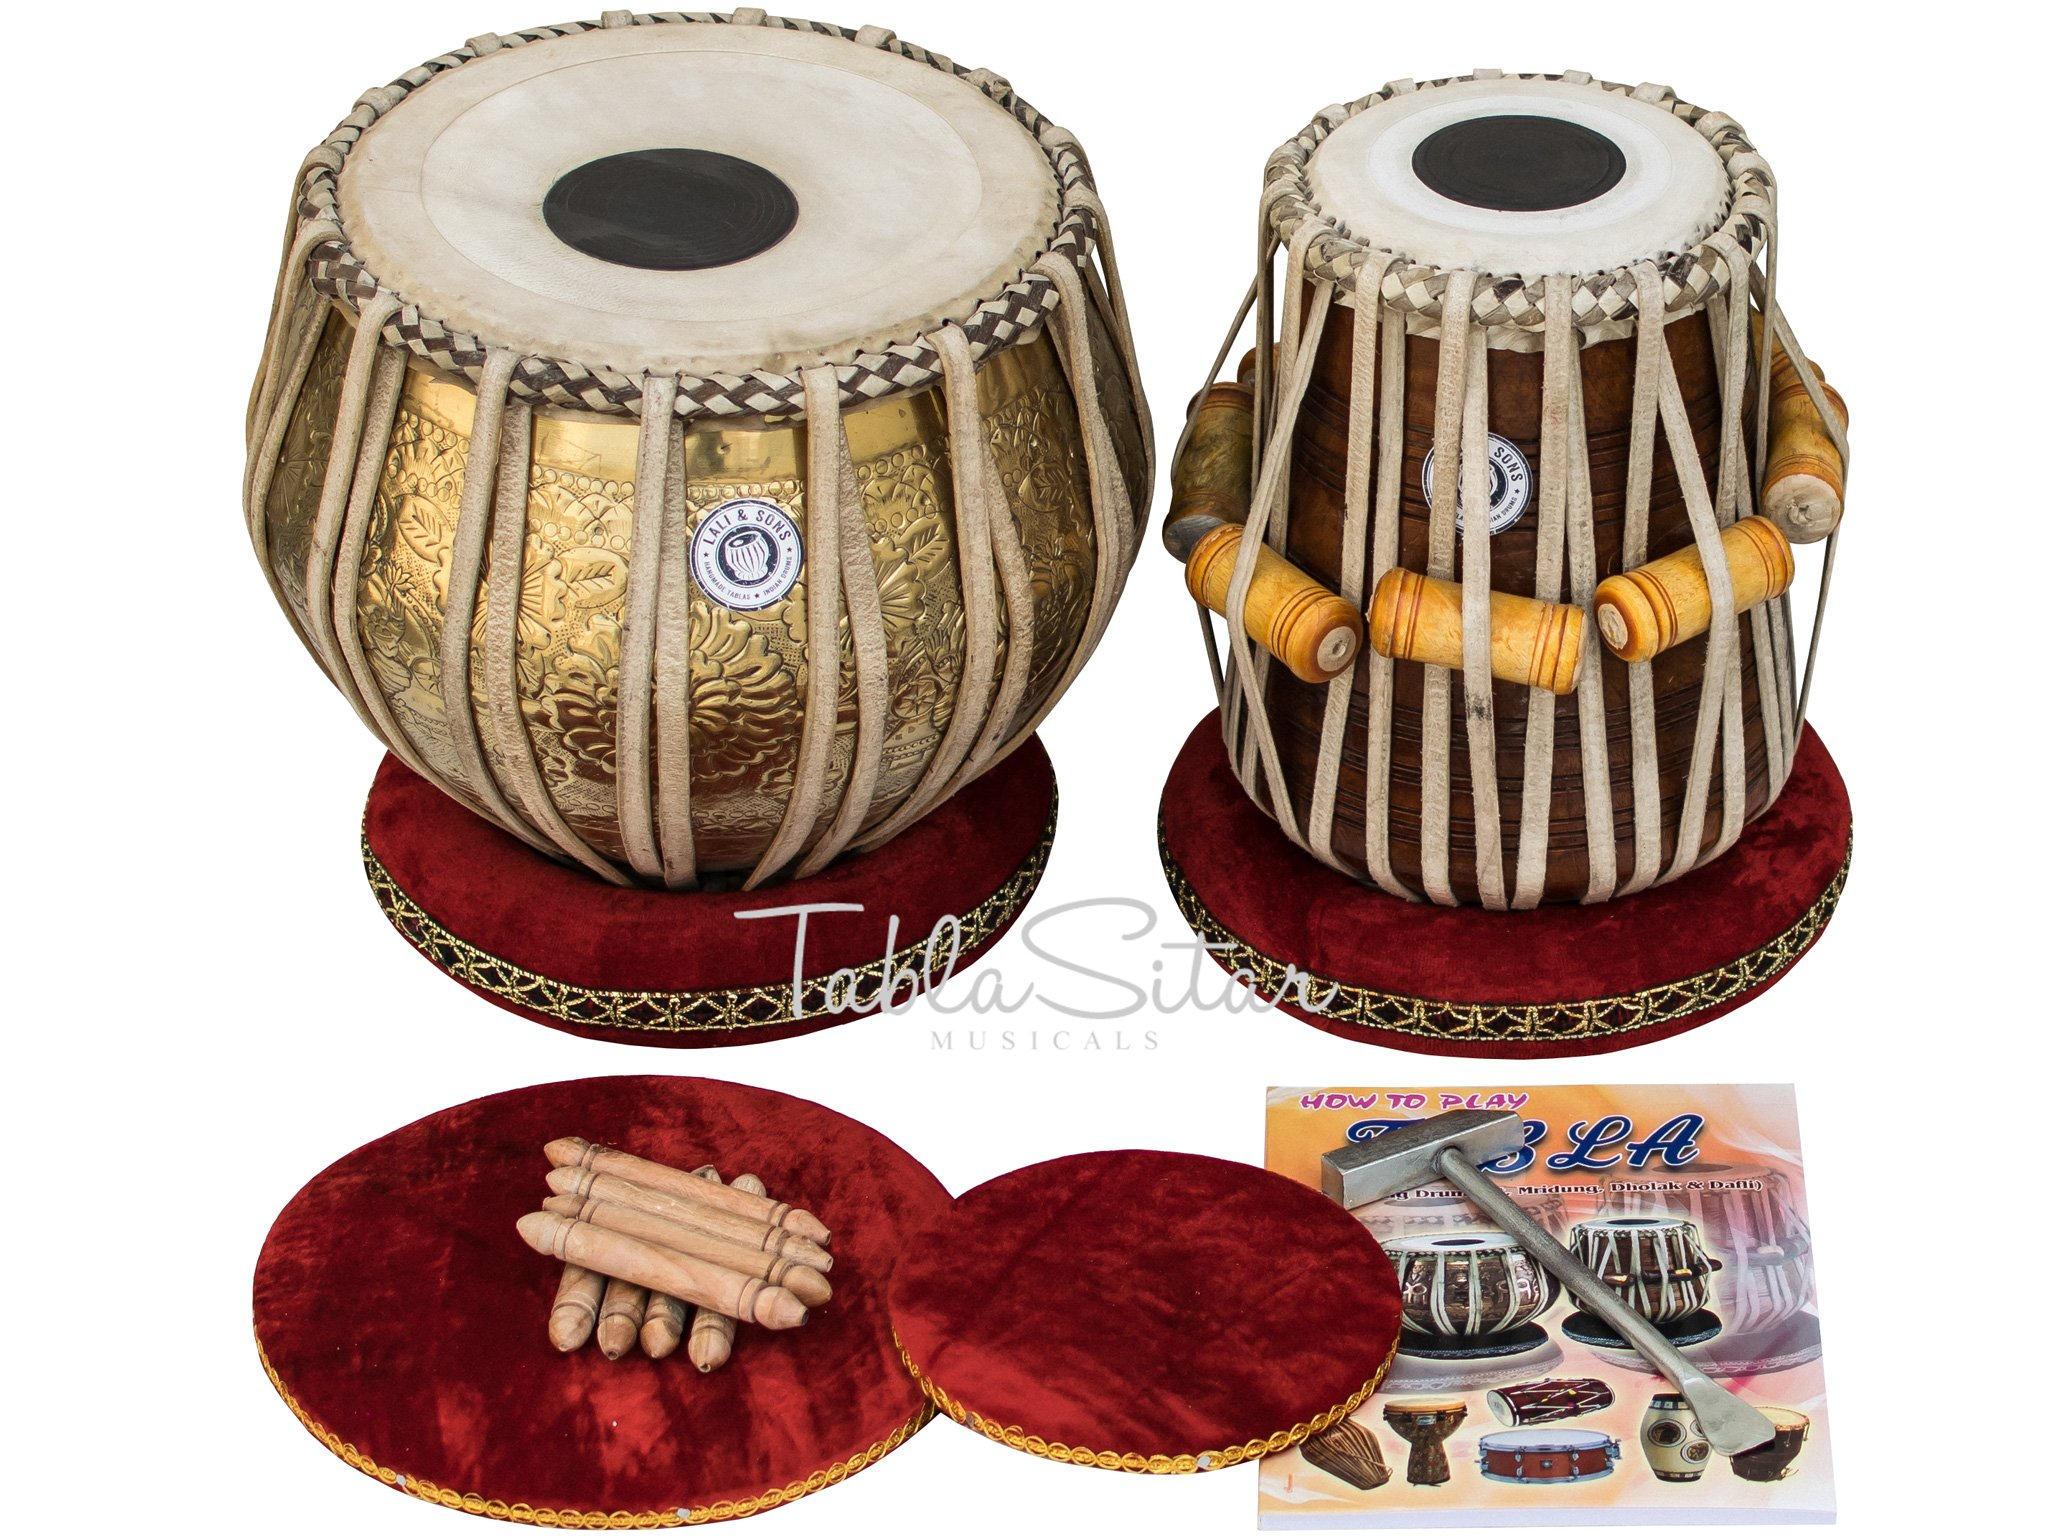 Maharaja Musicals Tabla Set, Professional, 3.5 Kg Brass Bayan - Ganesha and Rose Carving, Sheesham Dayan Tuned To C#, Padded Bag, Book, Hammer, Cushions, Cover, Tabla Hand Drums Indian (PDI-BHD) by Maharaja Musicals